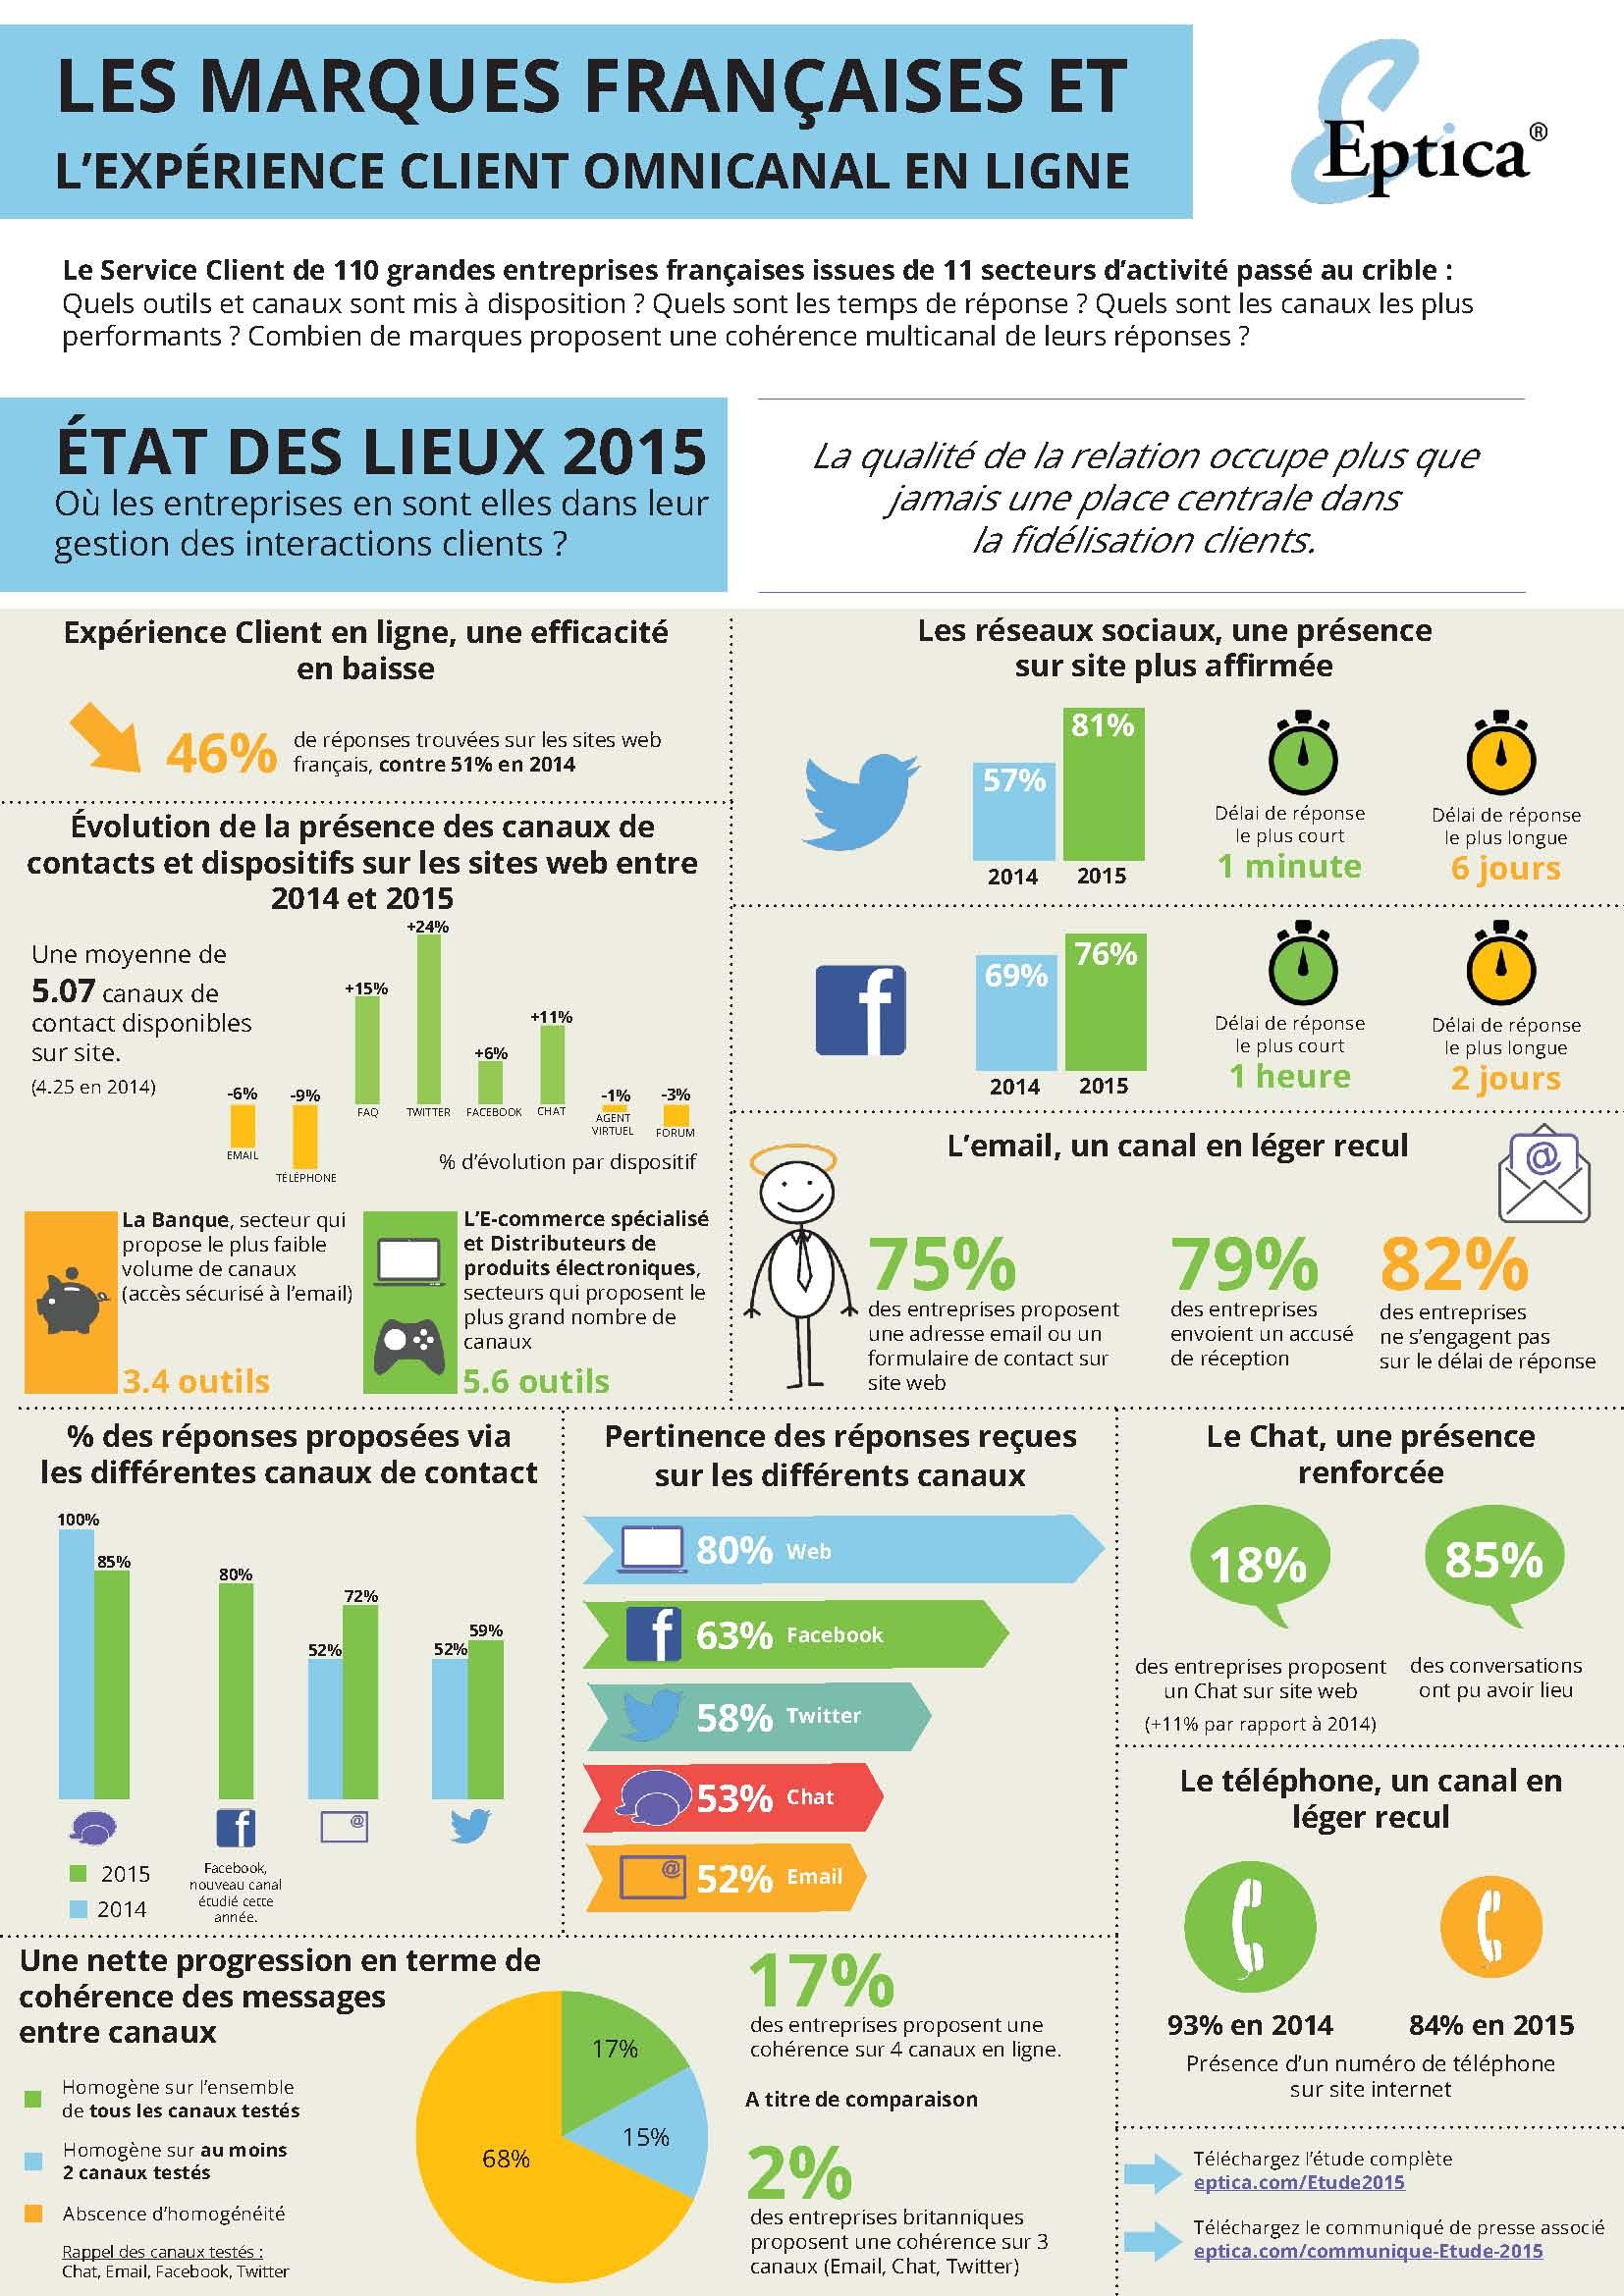 FR_06_15_Infographie_Etude_Omnicanal